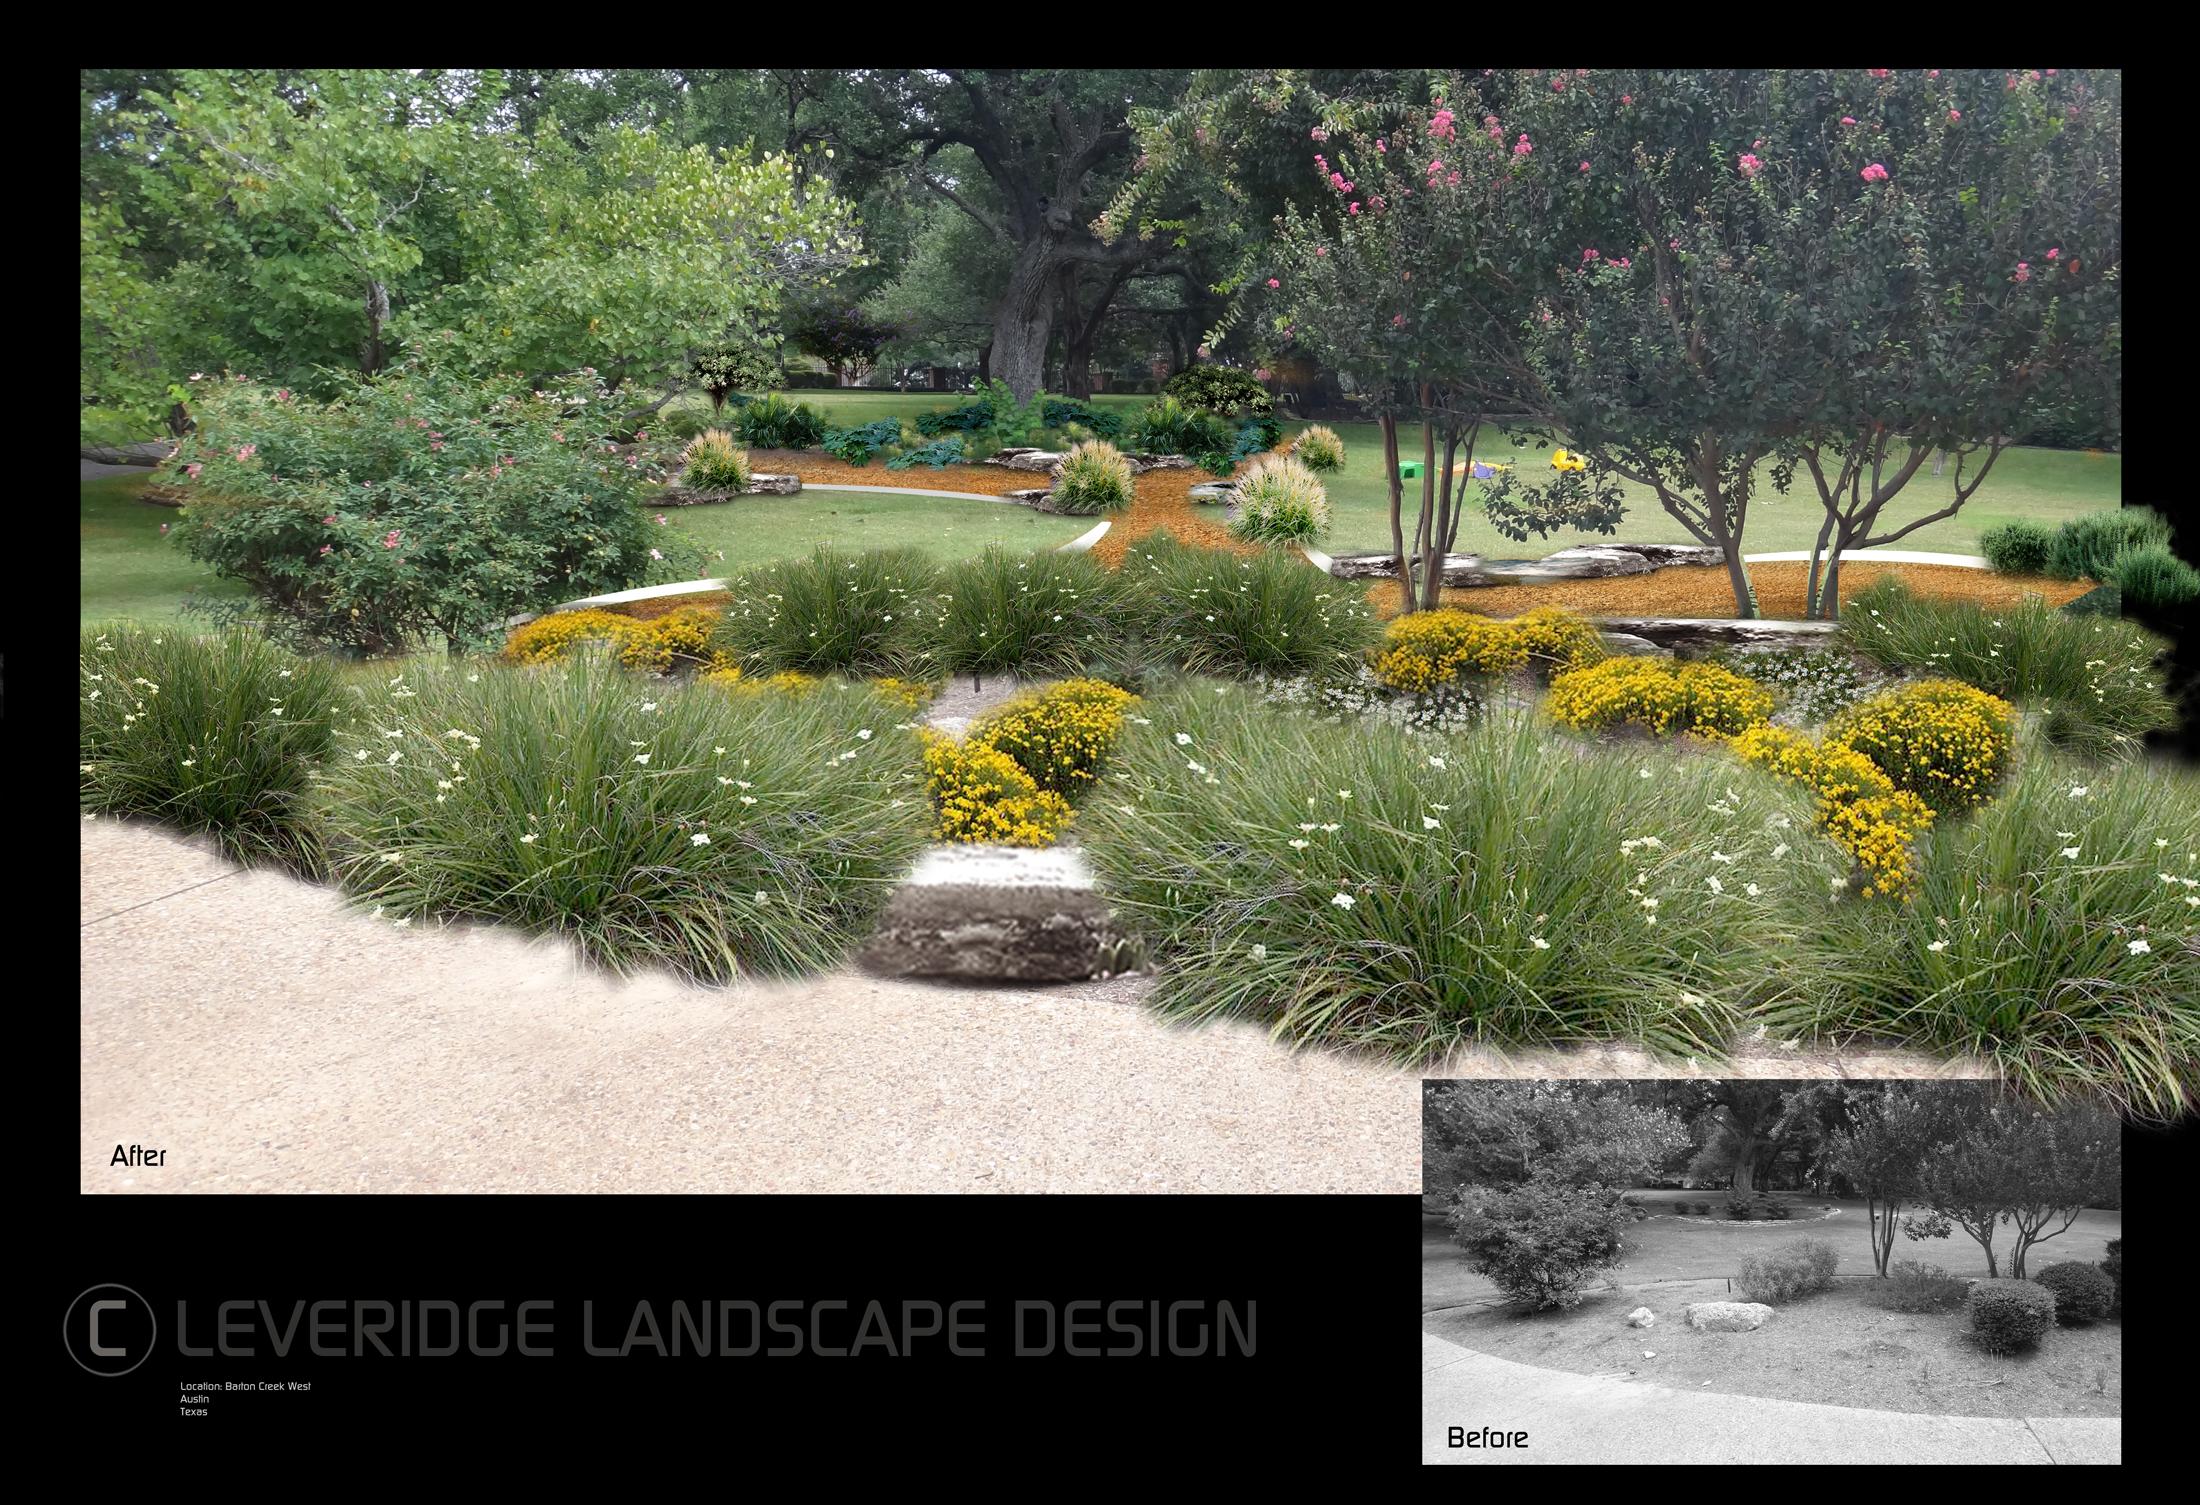 Leveridge Landscape Design_Design